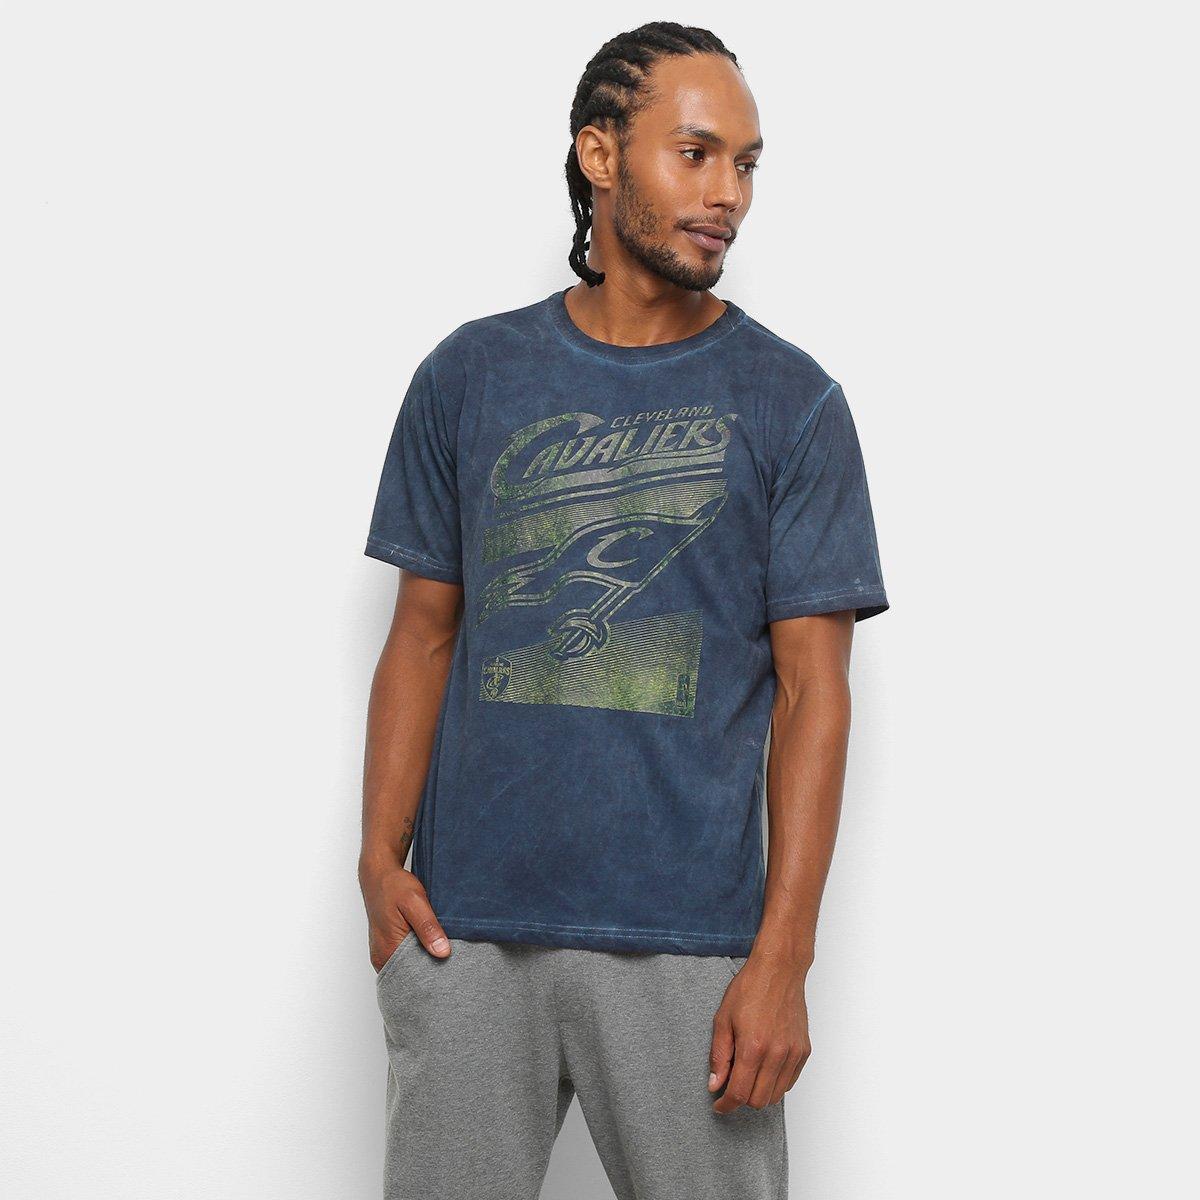 Camiseta NBA Cavaliers Marmorizada 17 Masculina - Compre Agora ... afdac56c92cc8